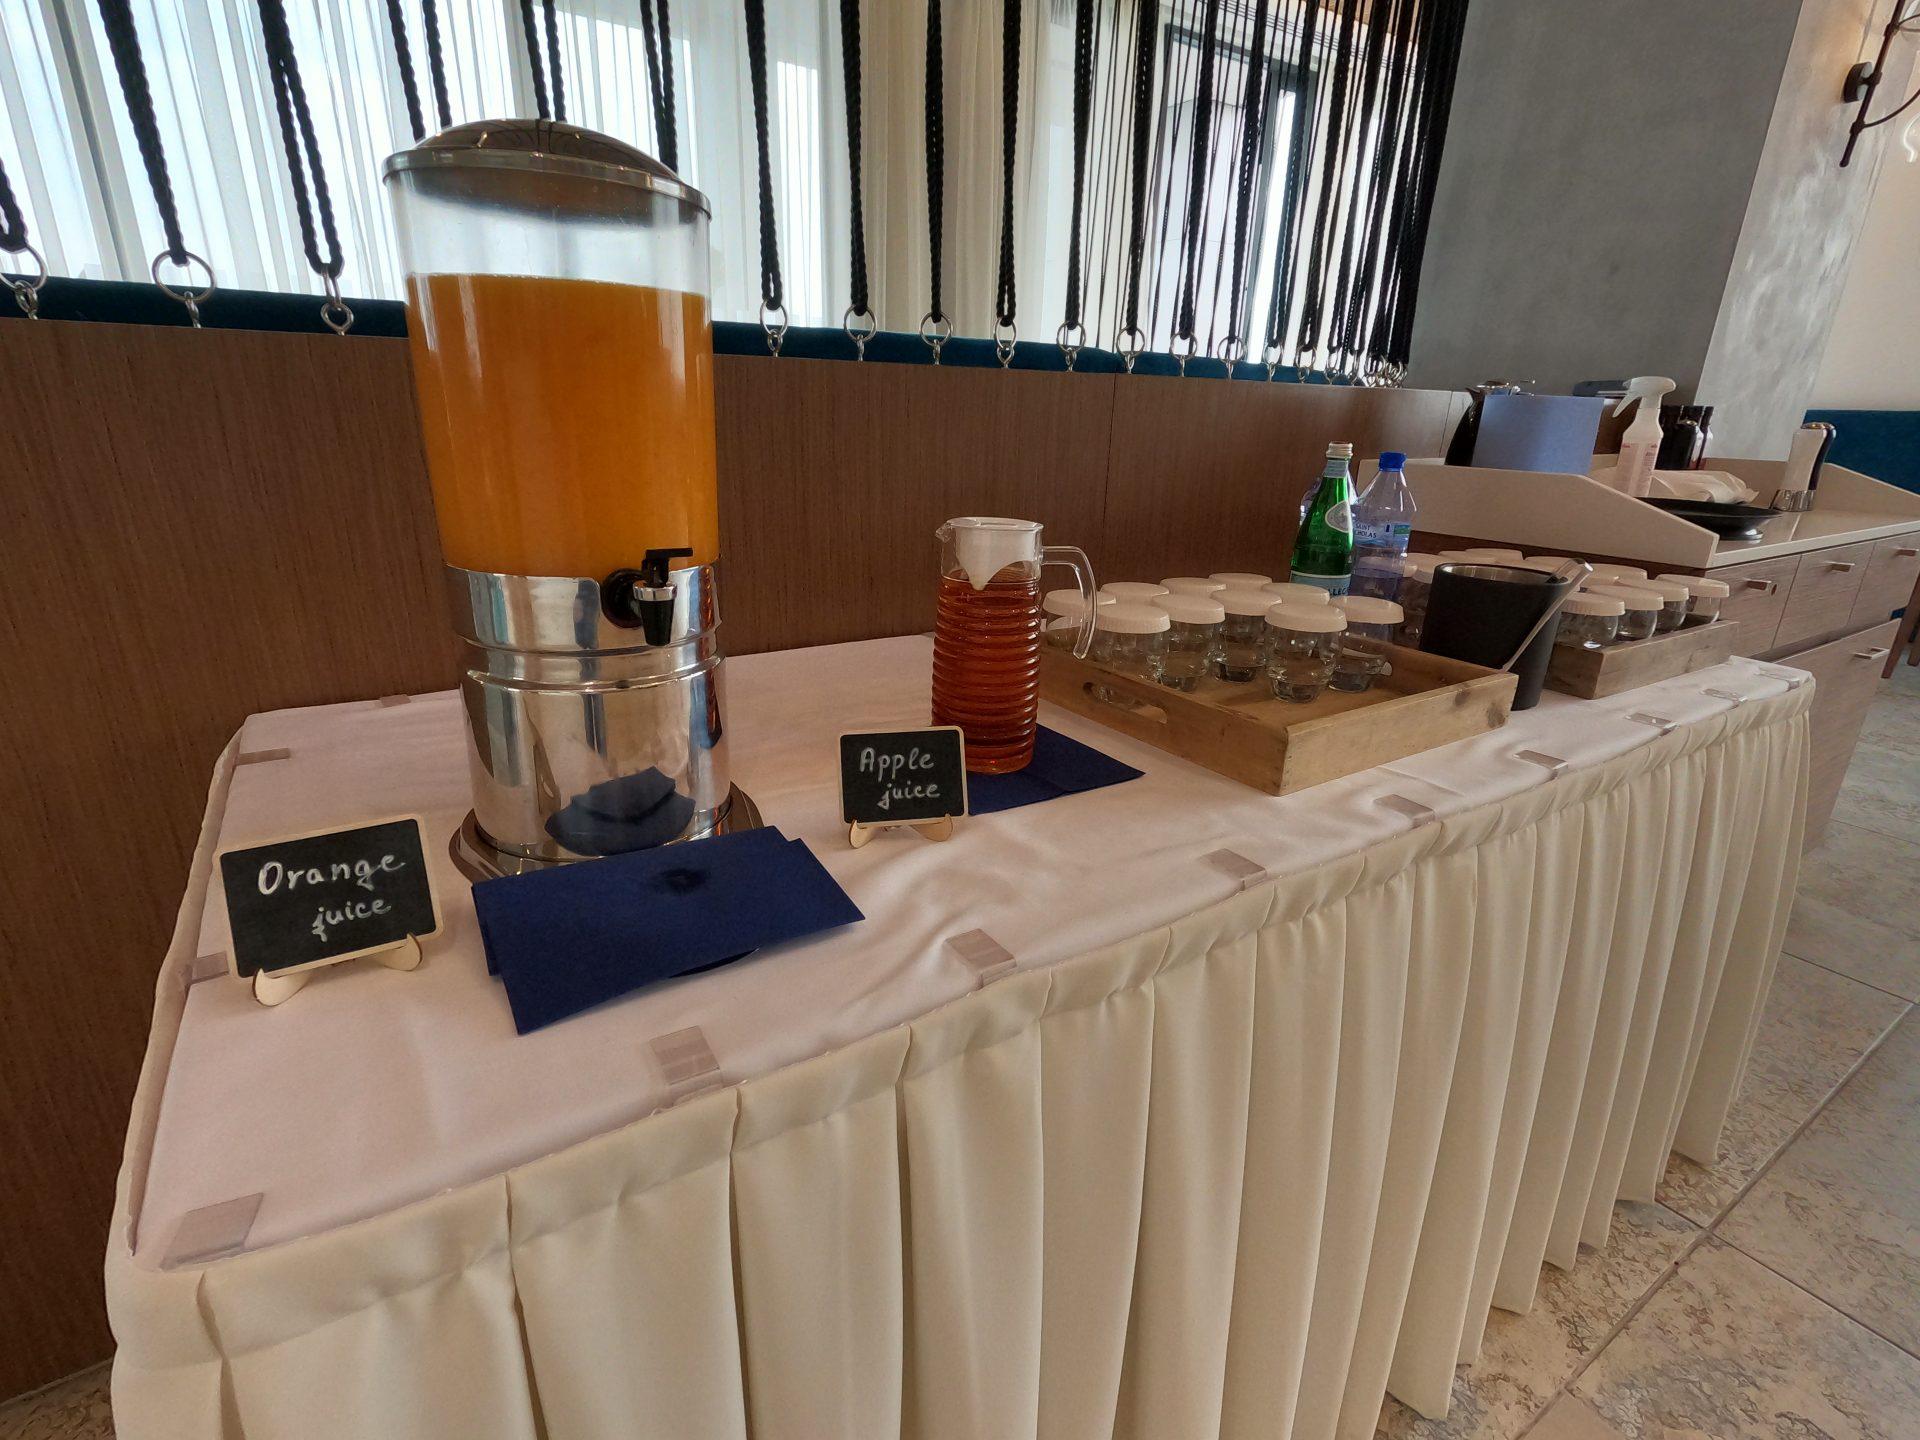 Orange juice, Apple juice and water